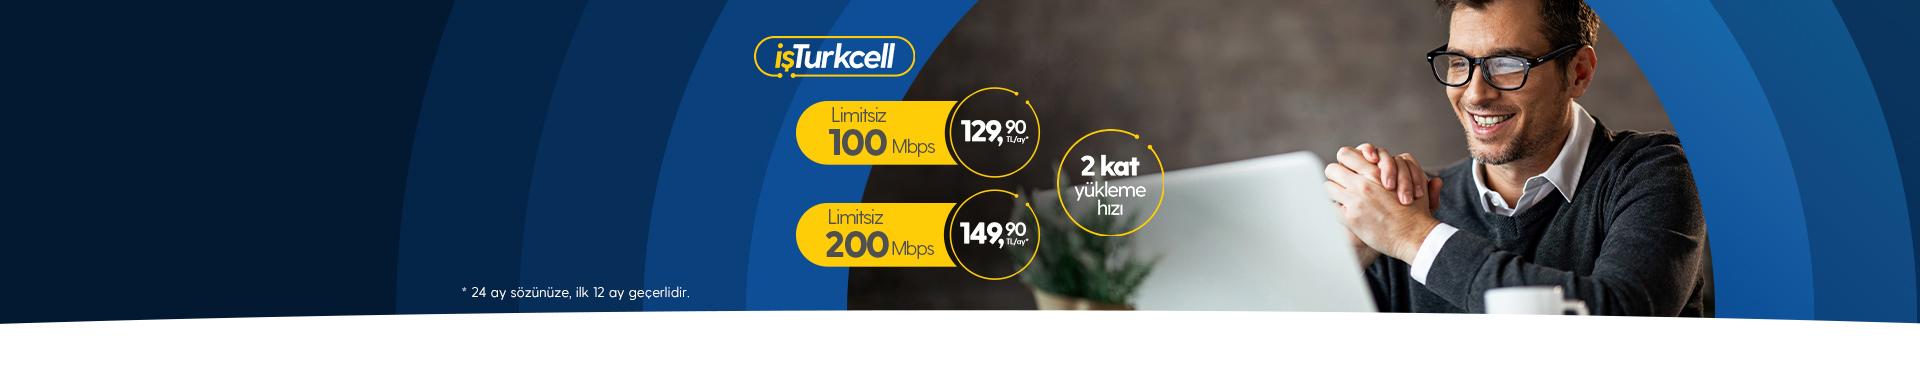 İşinize Turkcell fiber hızı!